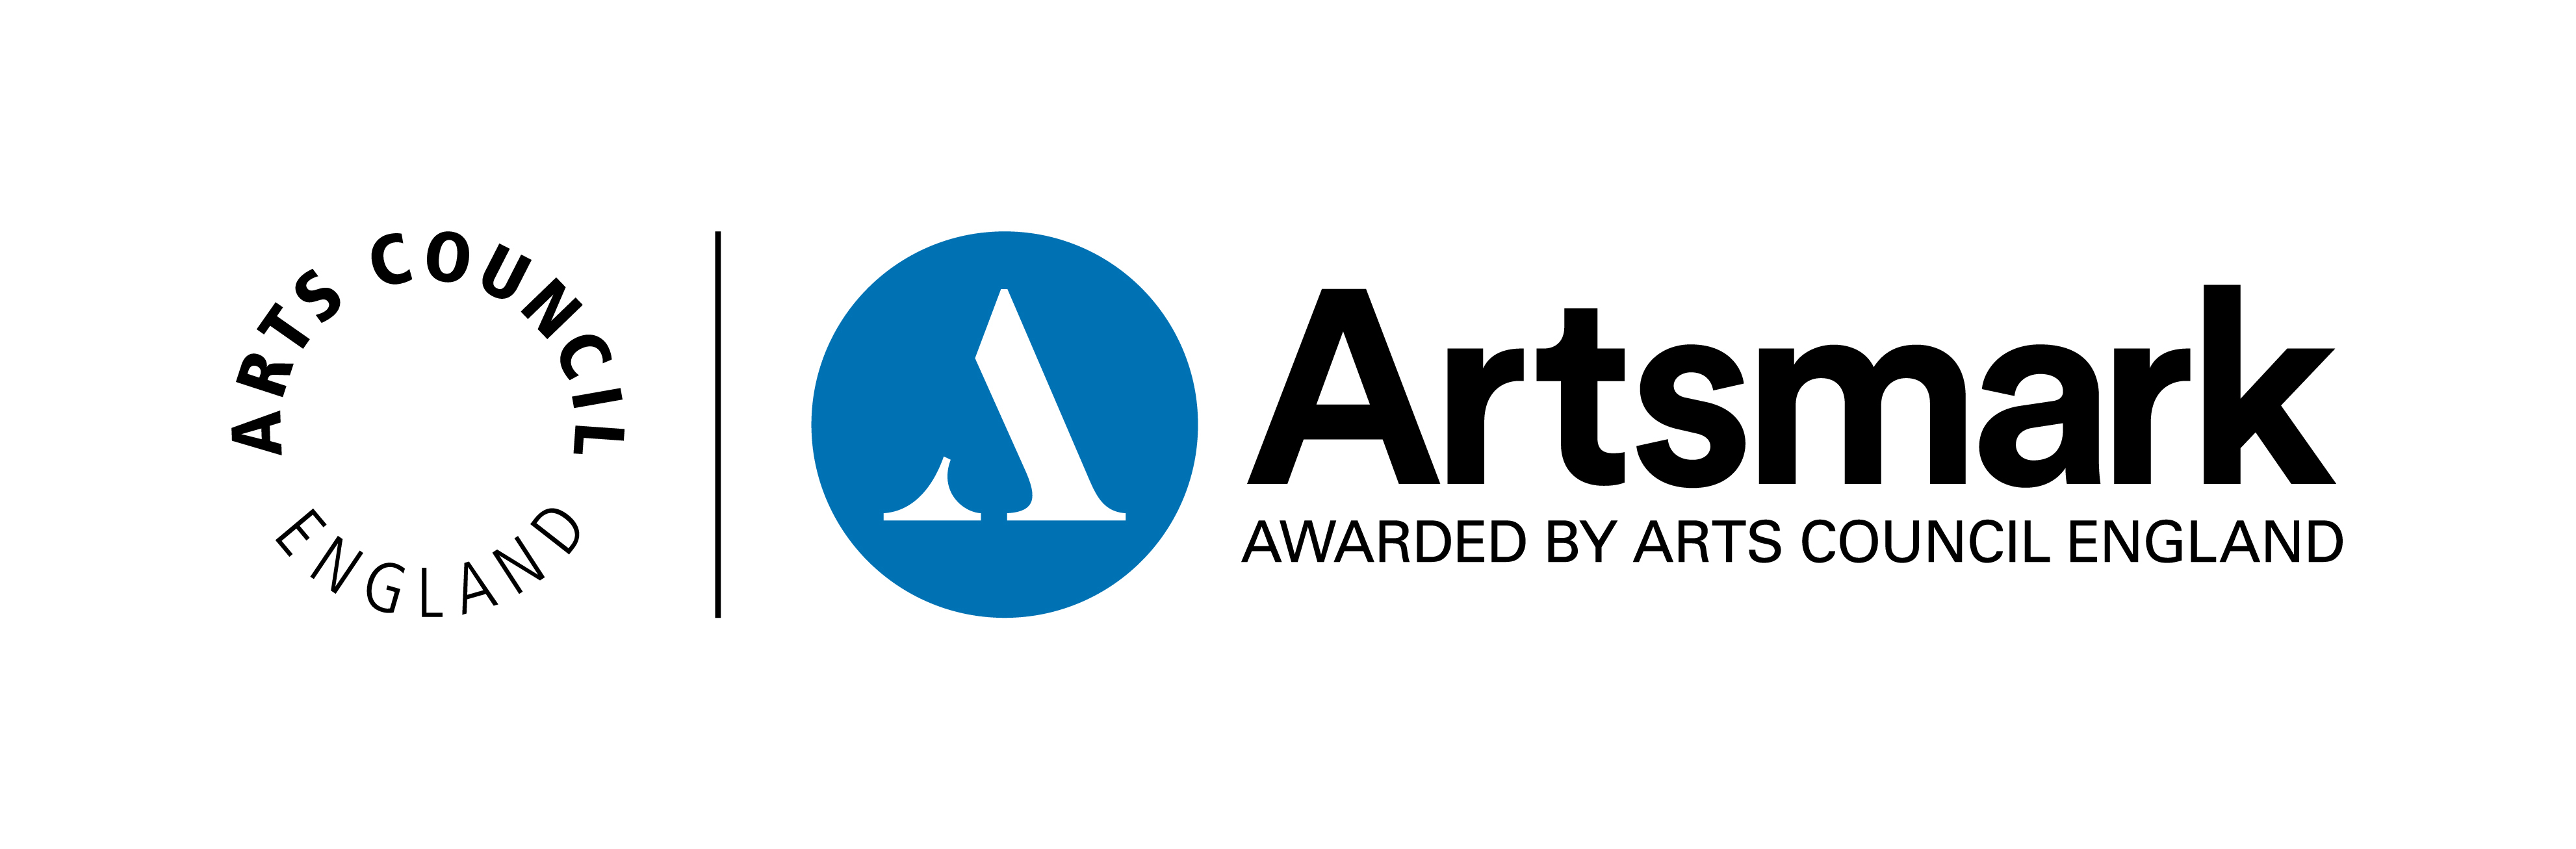 Artsmark_Logo_Lockup_Blue_RGB.jpg#asset:1071